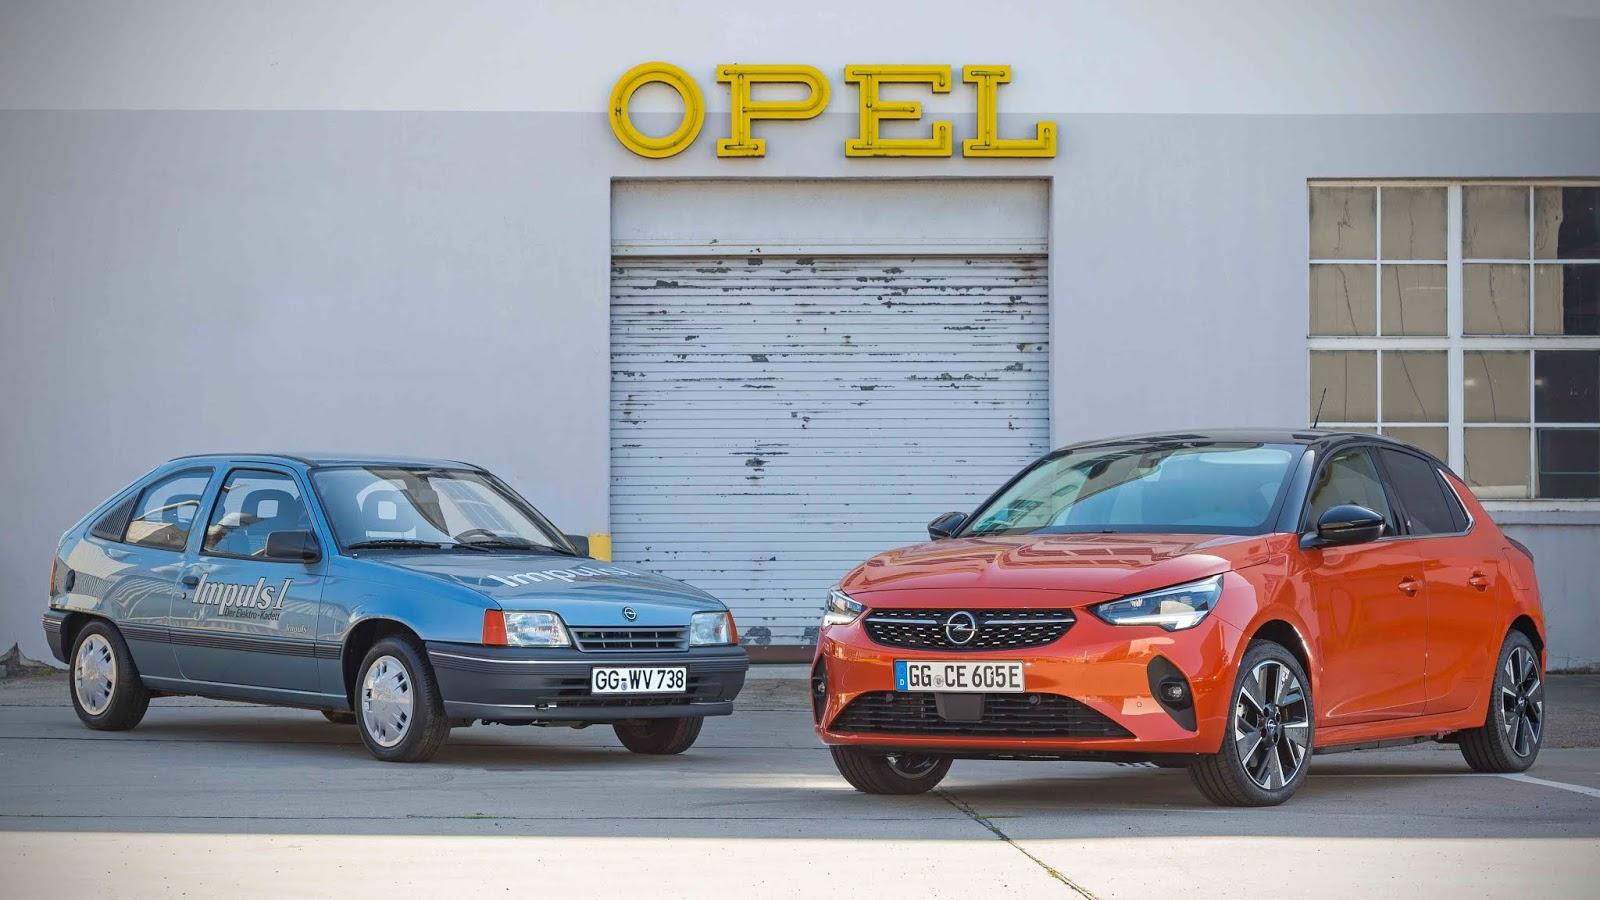 Nostalgie : Opel Kadett electrique contre Corsa e   frenchtouch2